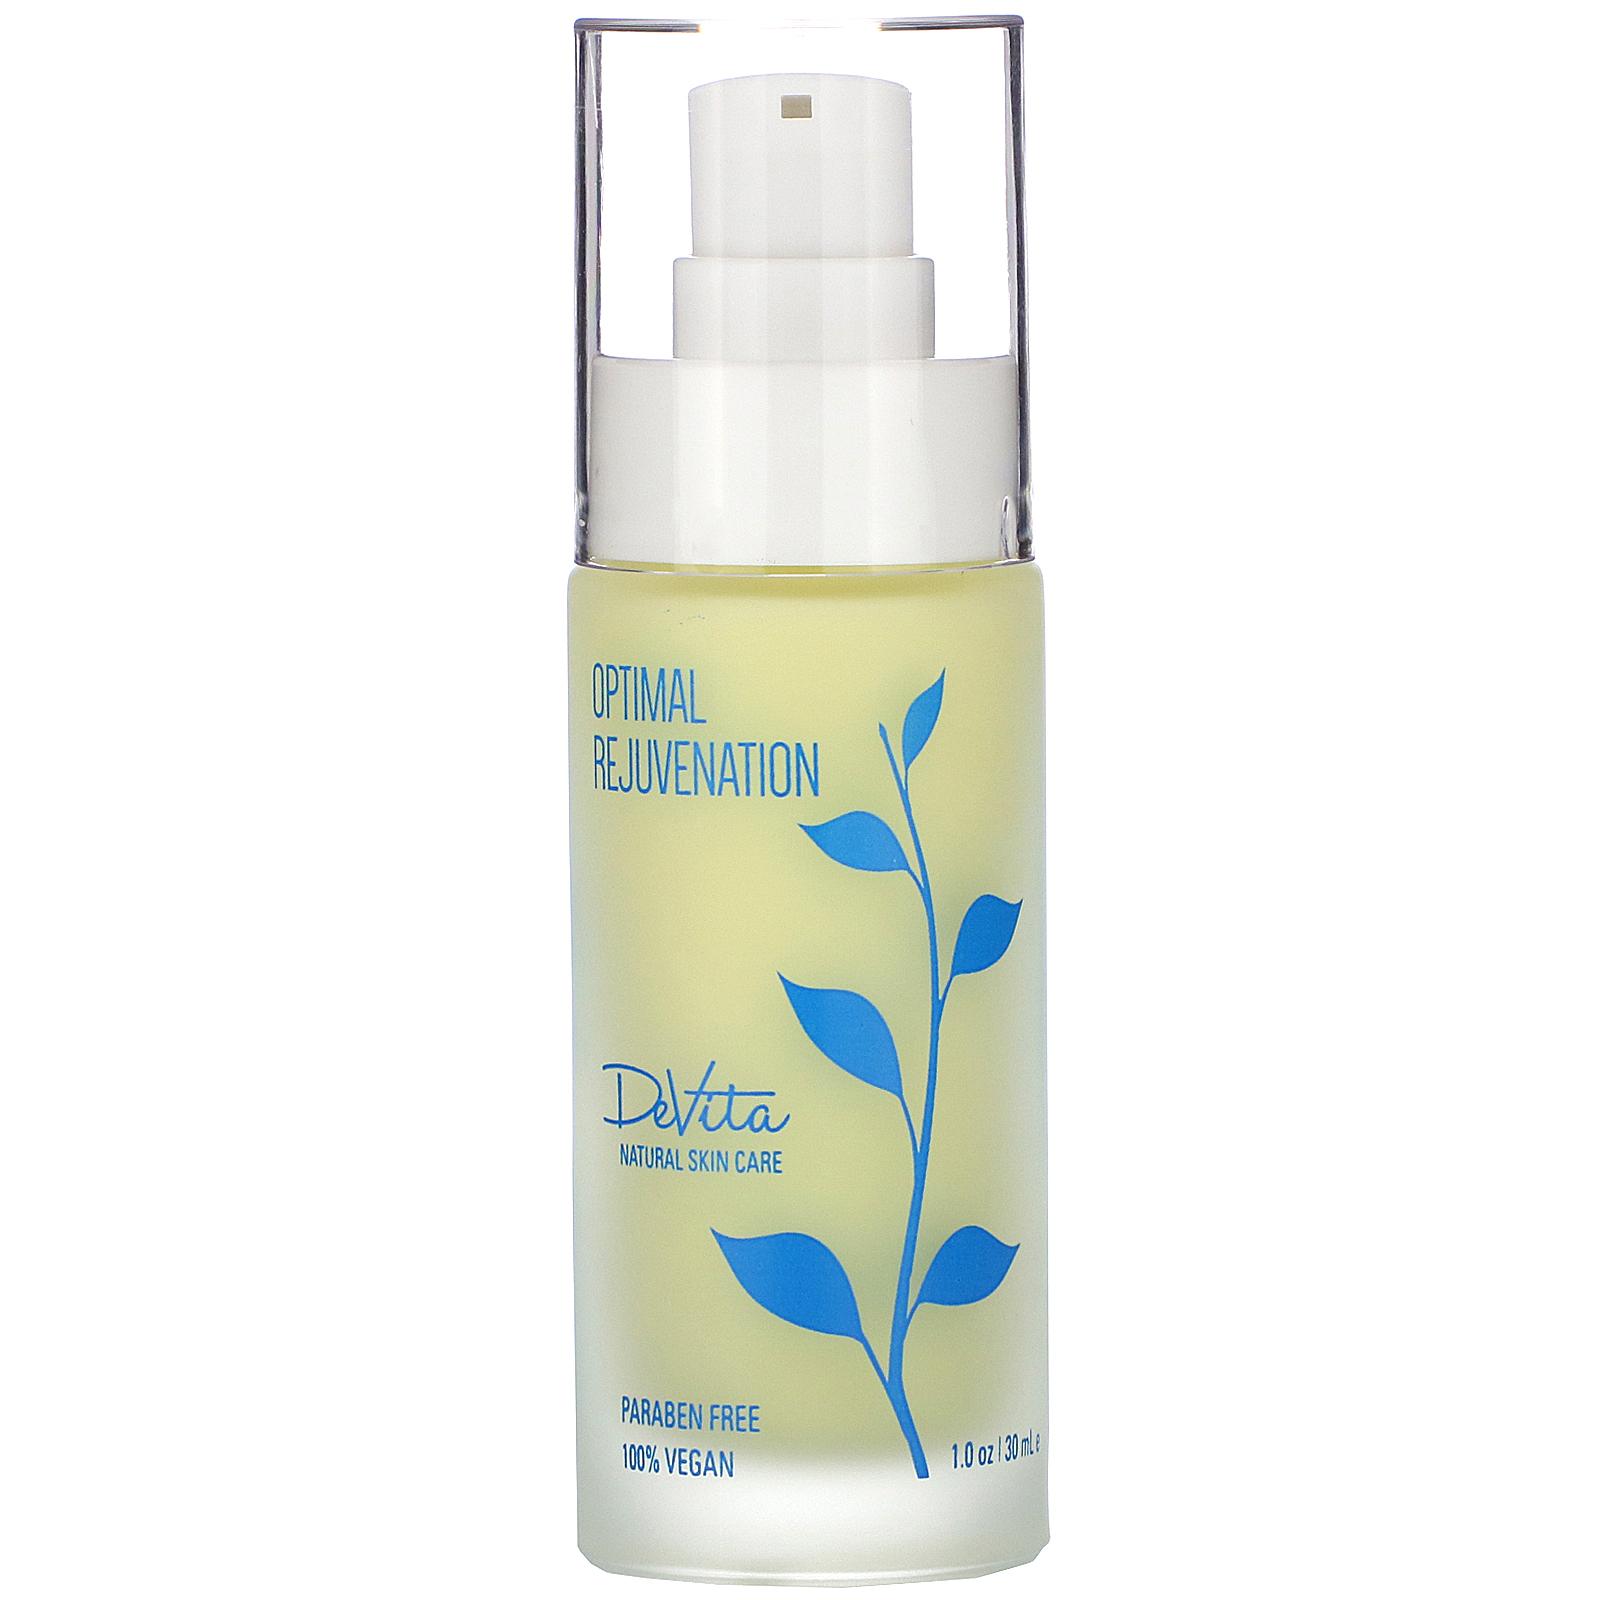 Devita Natural Skin Care Optimal Rejuvenation 1 Oz 30 Ml Iherb